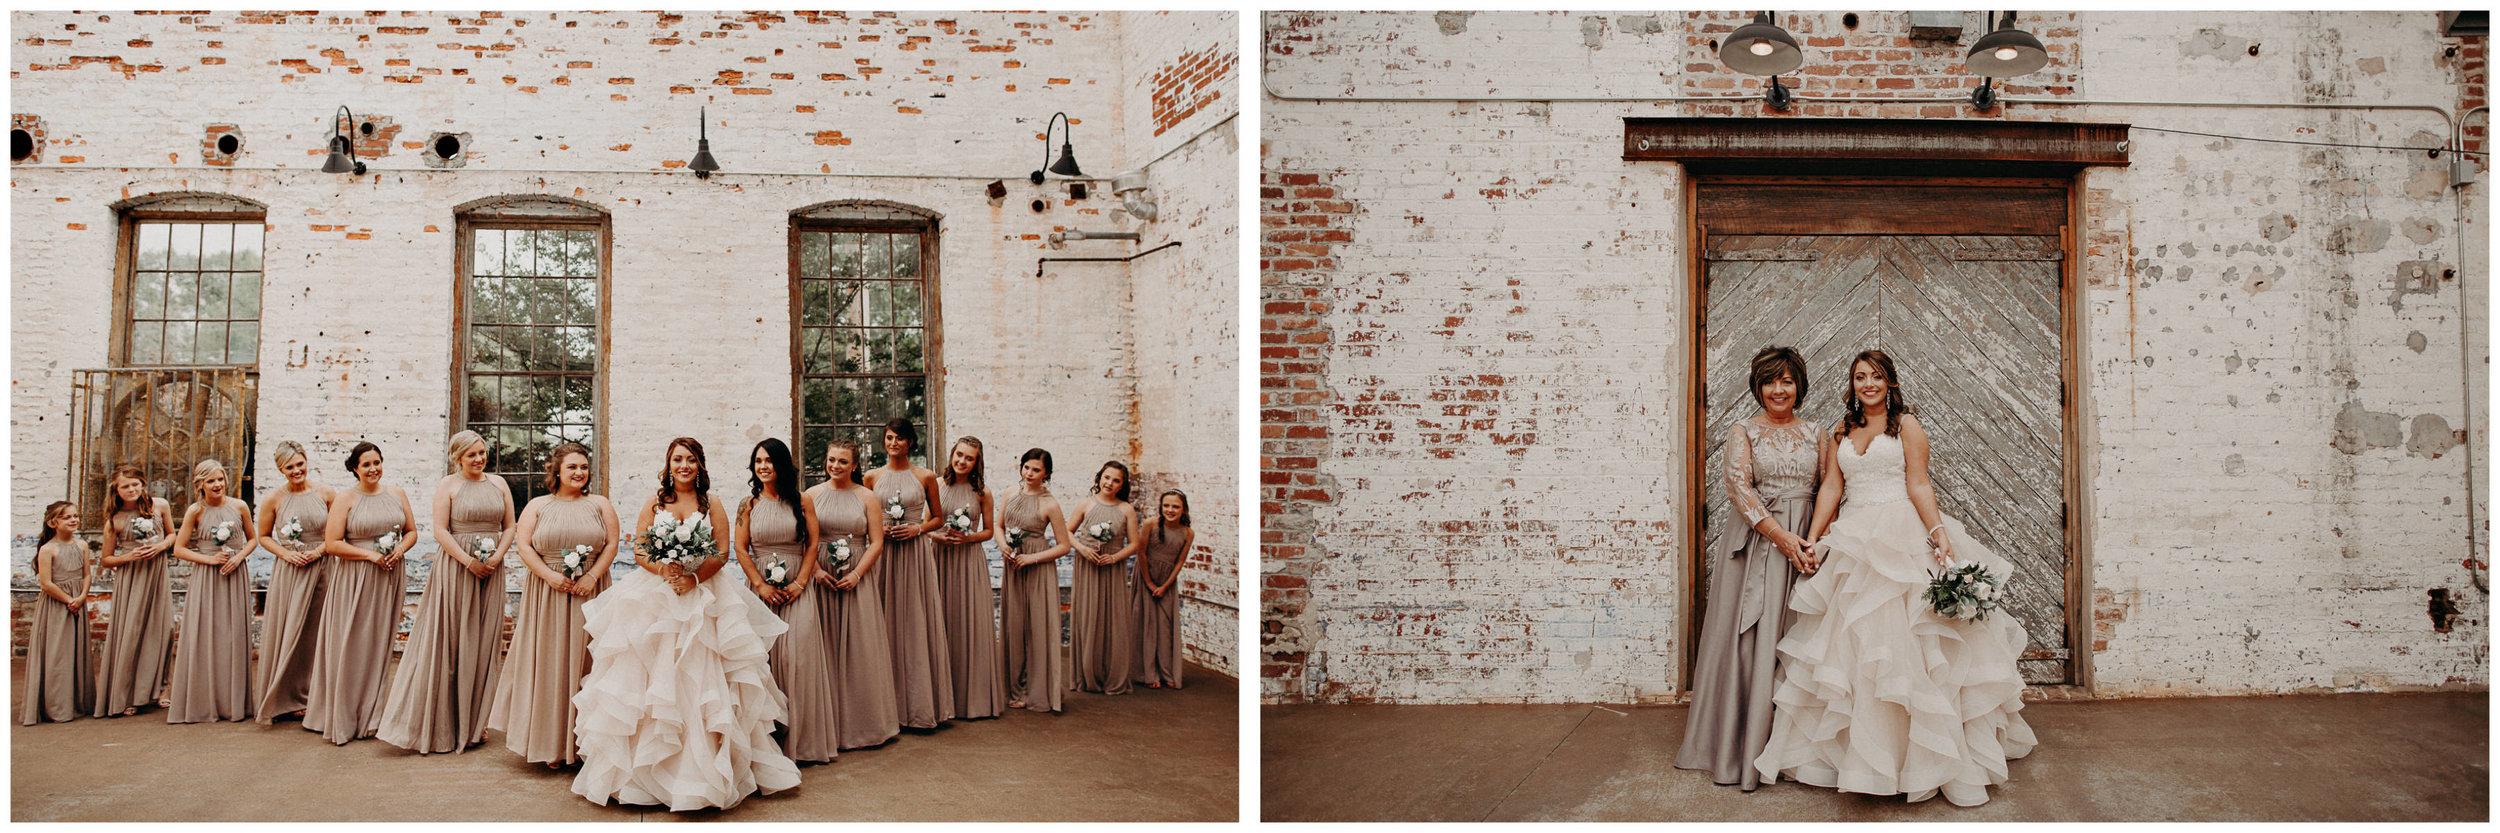 23 4 - Atlanta Wedding Photographer - The engine room - Ga - Wedding trends - Aline Marin Photography.jpg